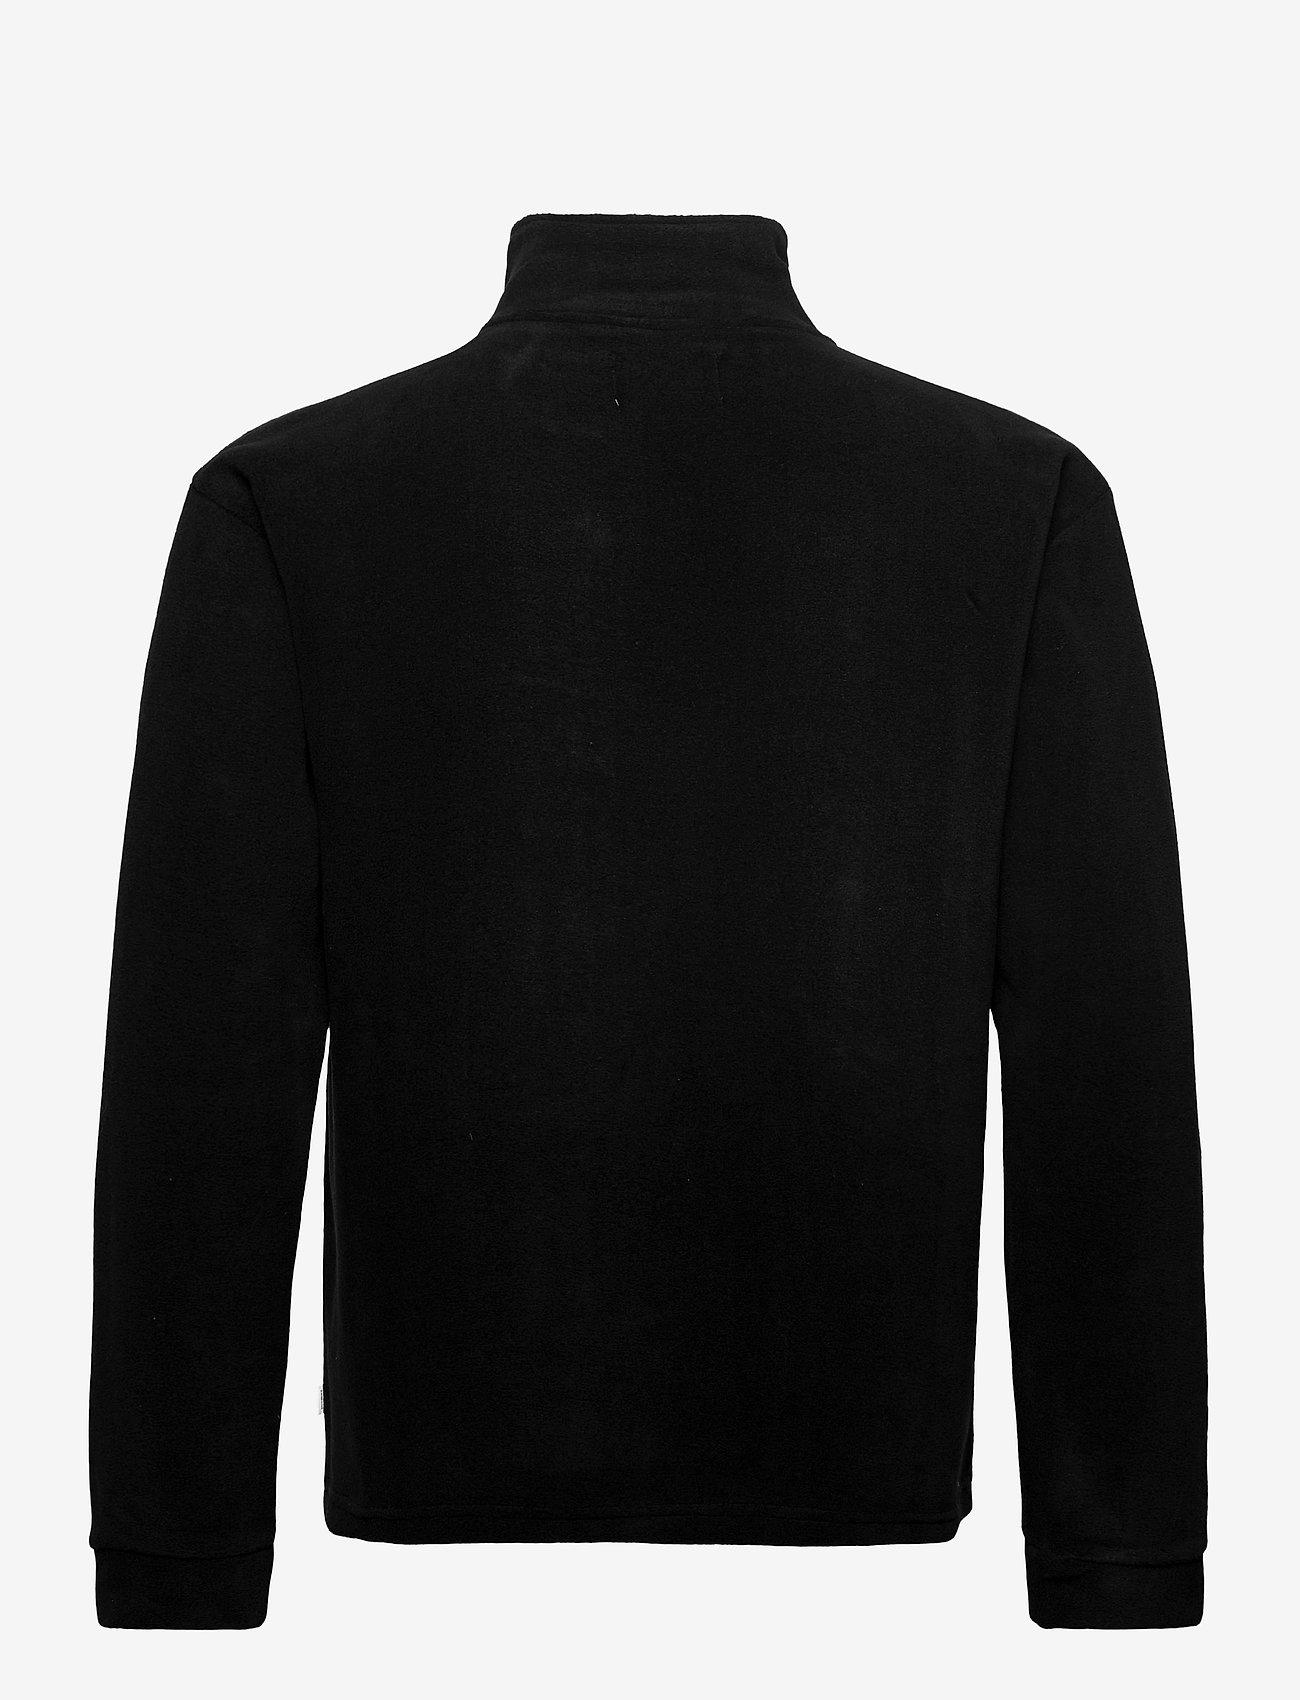 Woodbird - Frinck Fleece zip - basic-sweatshirts - black - 1